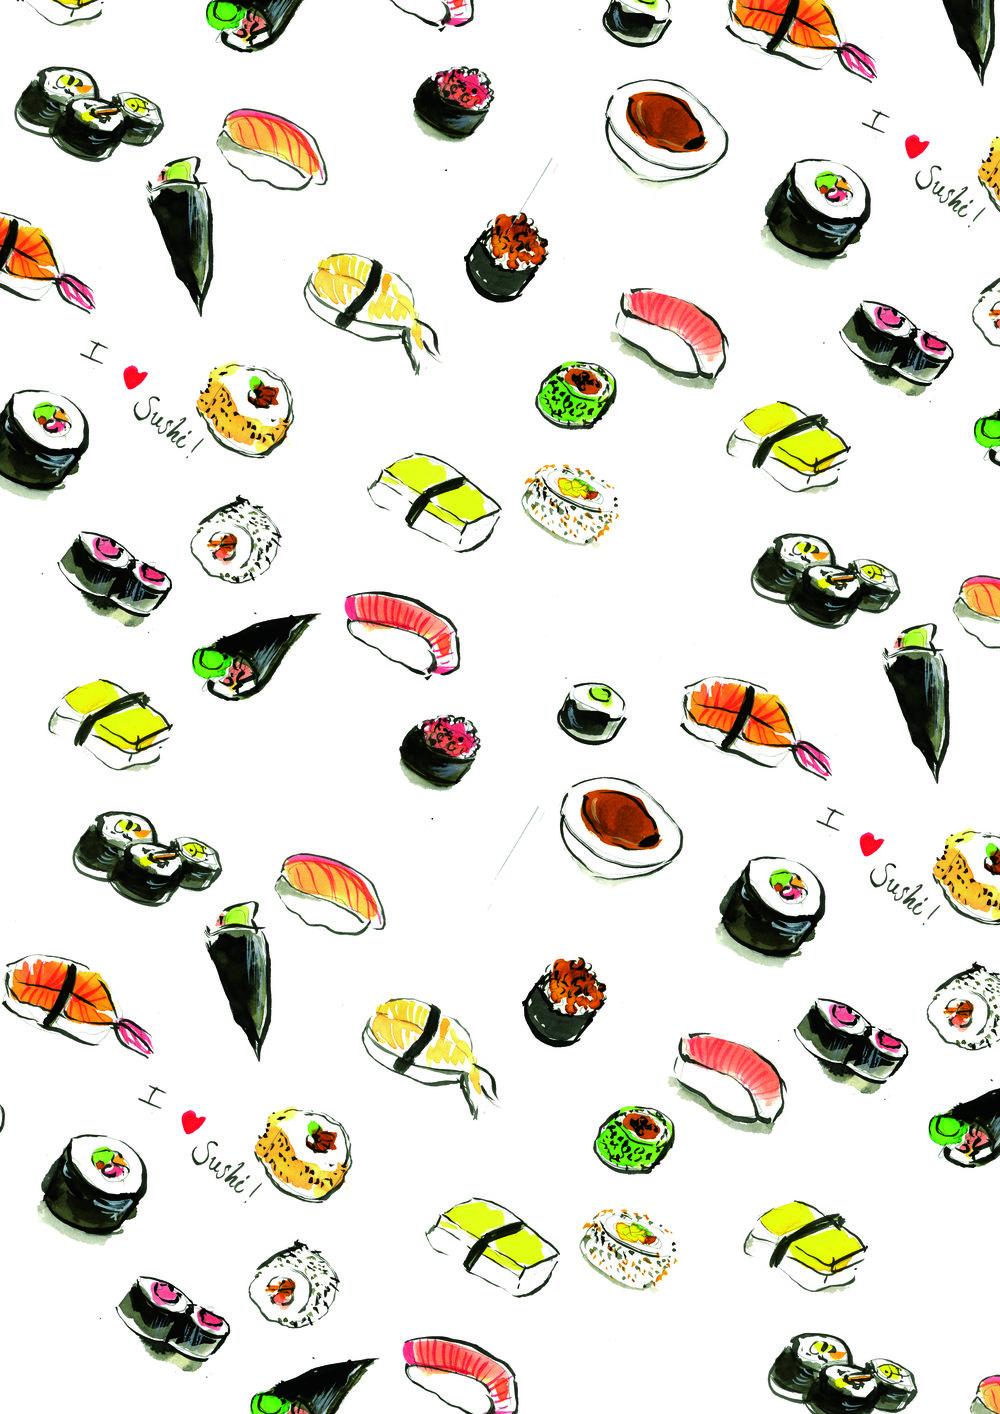 Wallpaper_Sushi.jpg